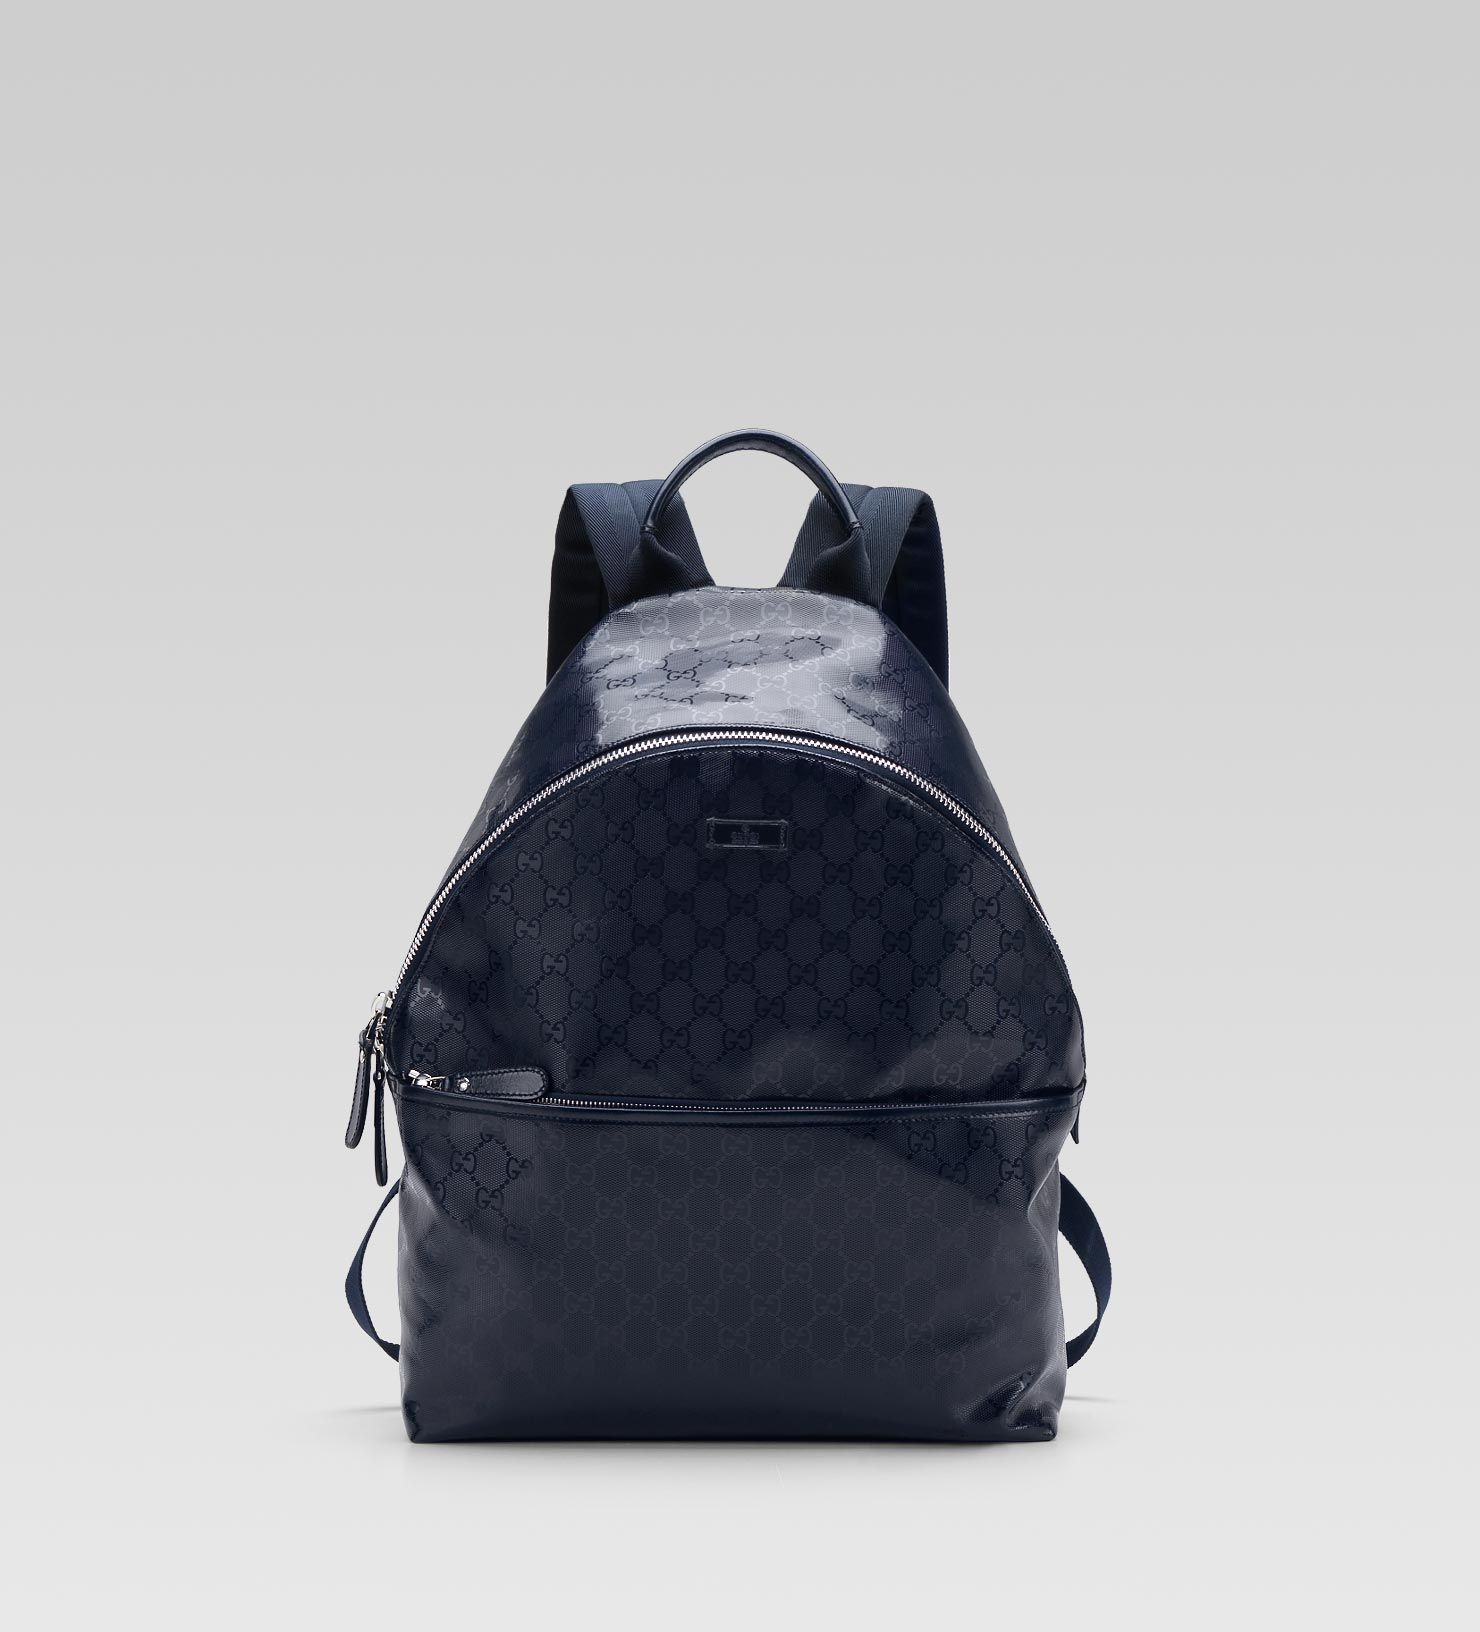 41a879a7e66b Gucci men blue GG imprime backpack 1 | Stuff to buy | Gucci men ...